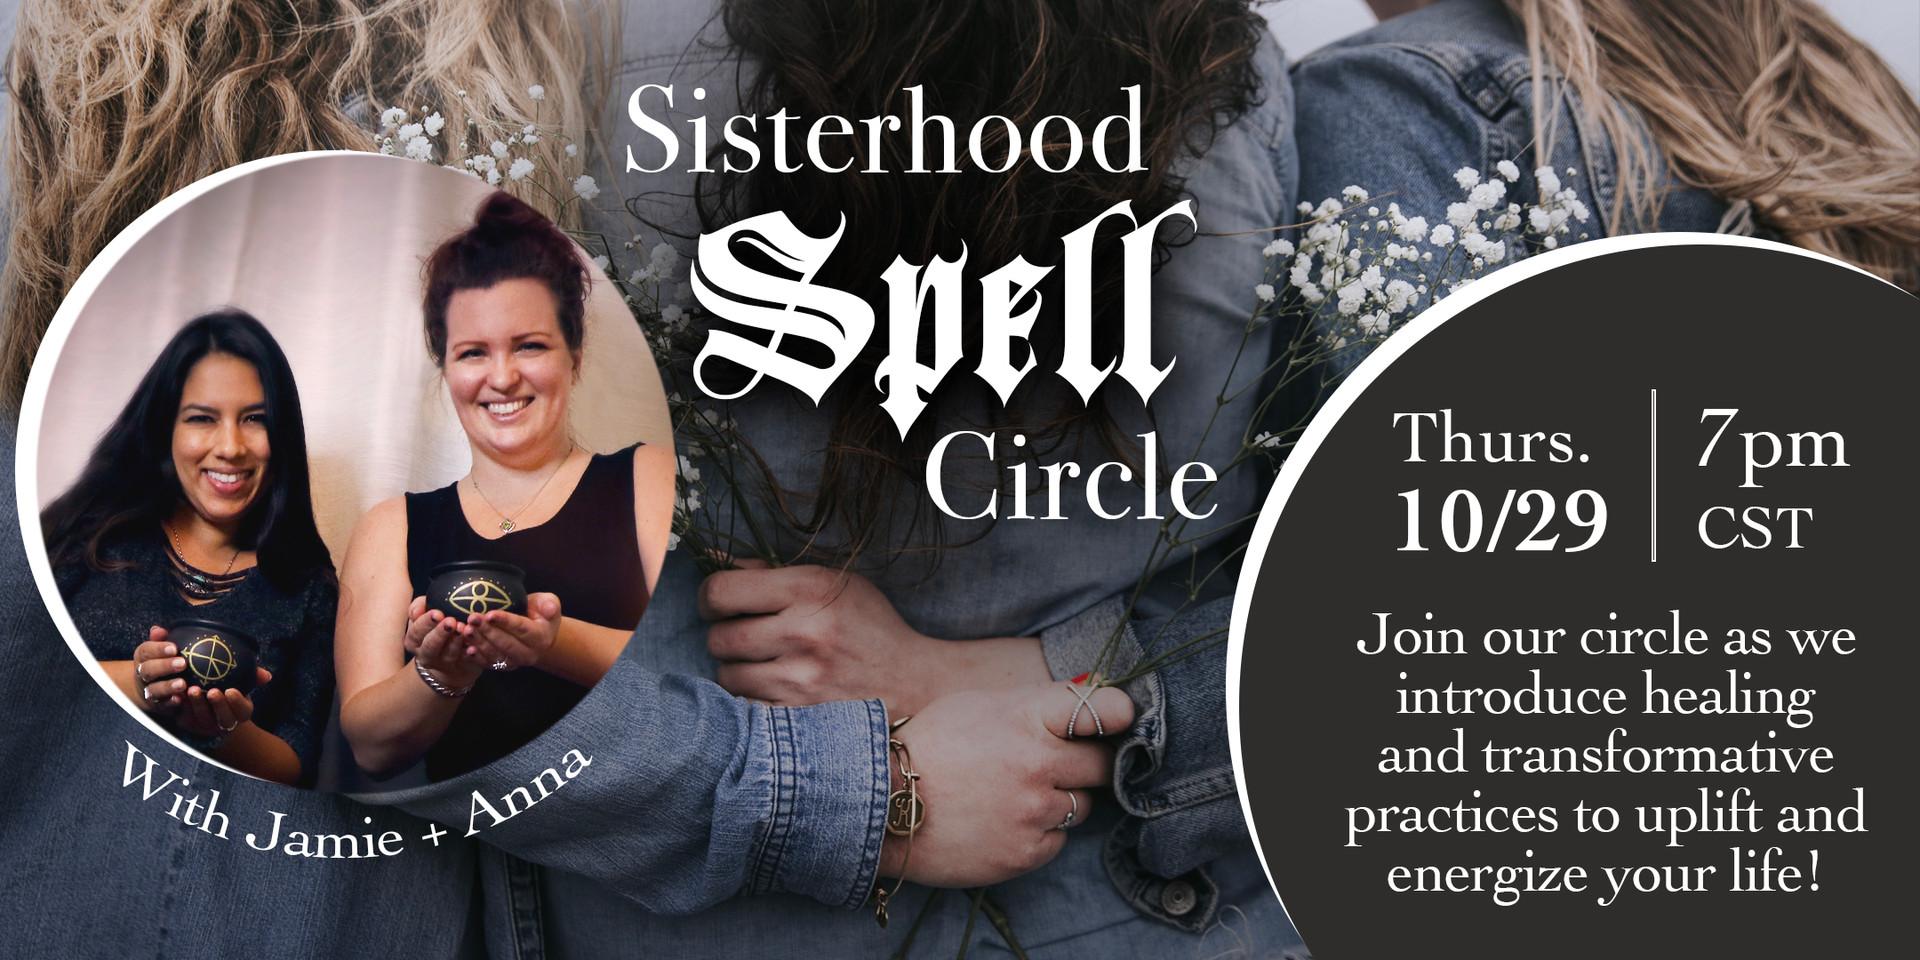 sisterhood-spell-circle.jpg